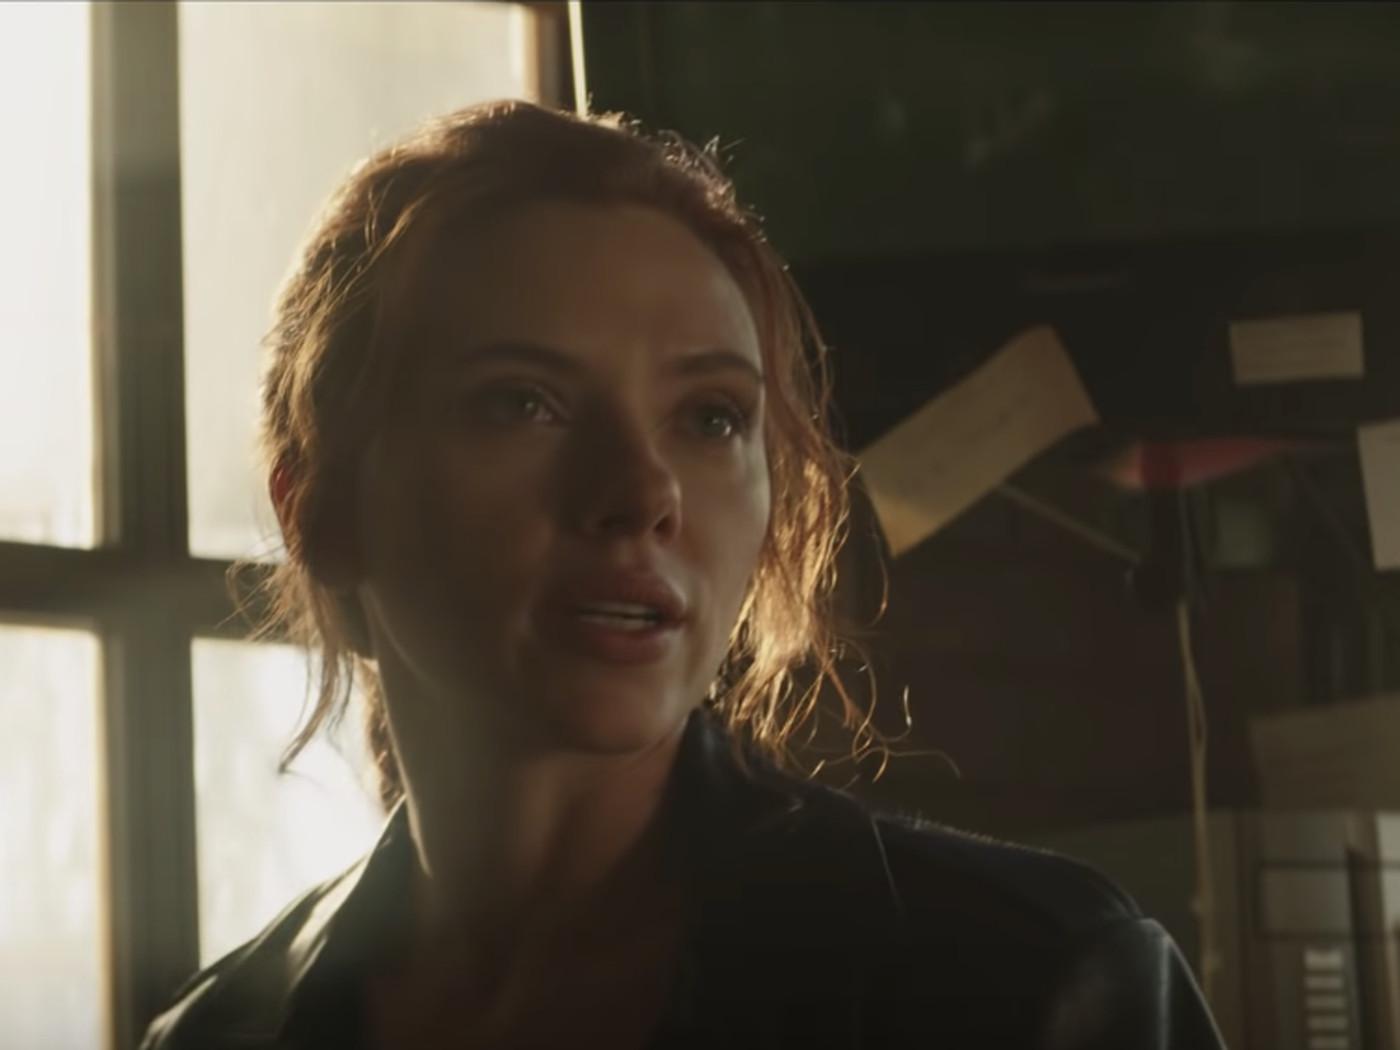 New Black Widow Trailer Introduces A New Enemy Taskmaster